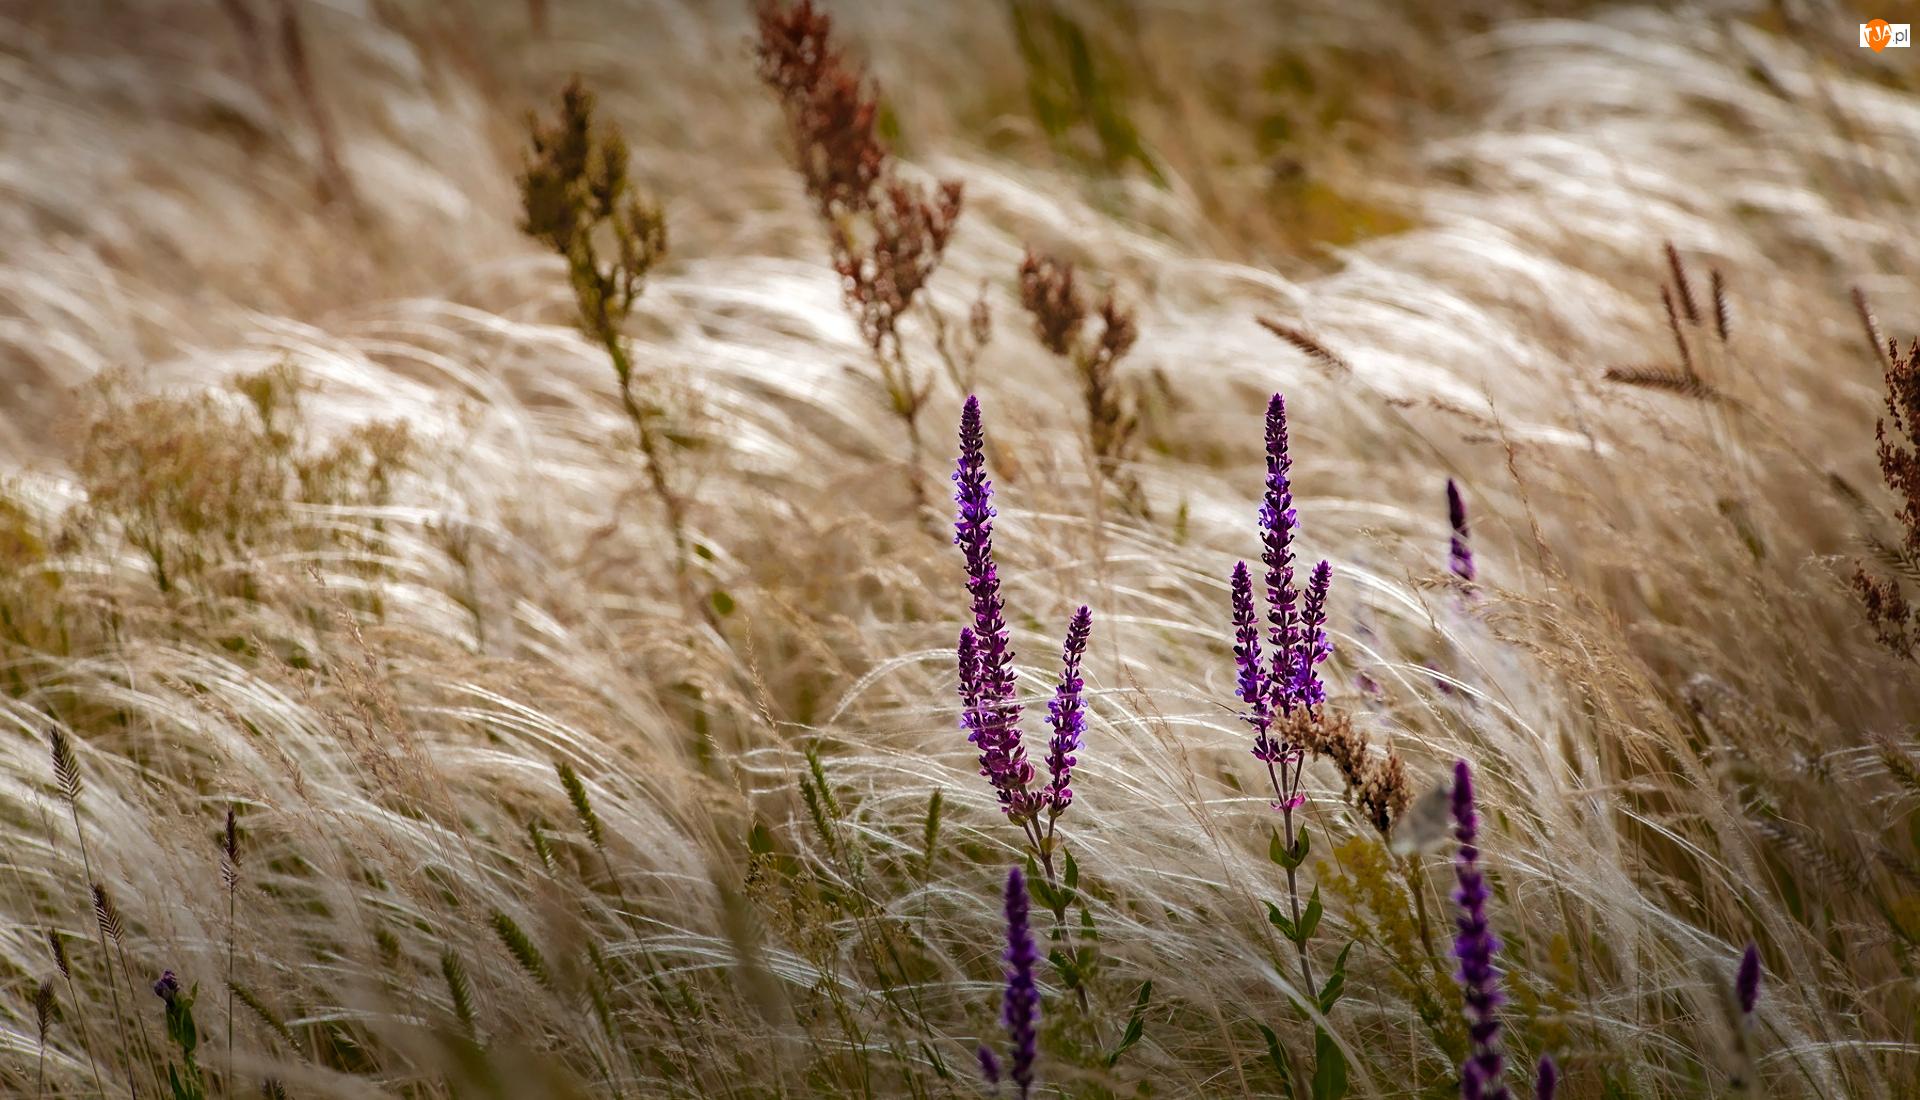 Lawenda, Trawa, Fioletowe, Kwiaty